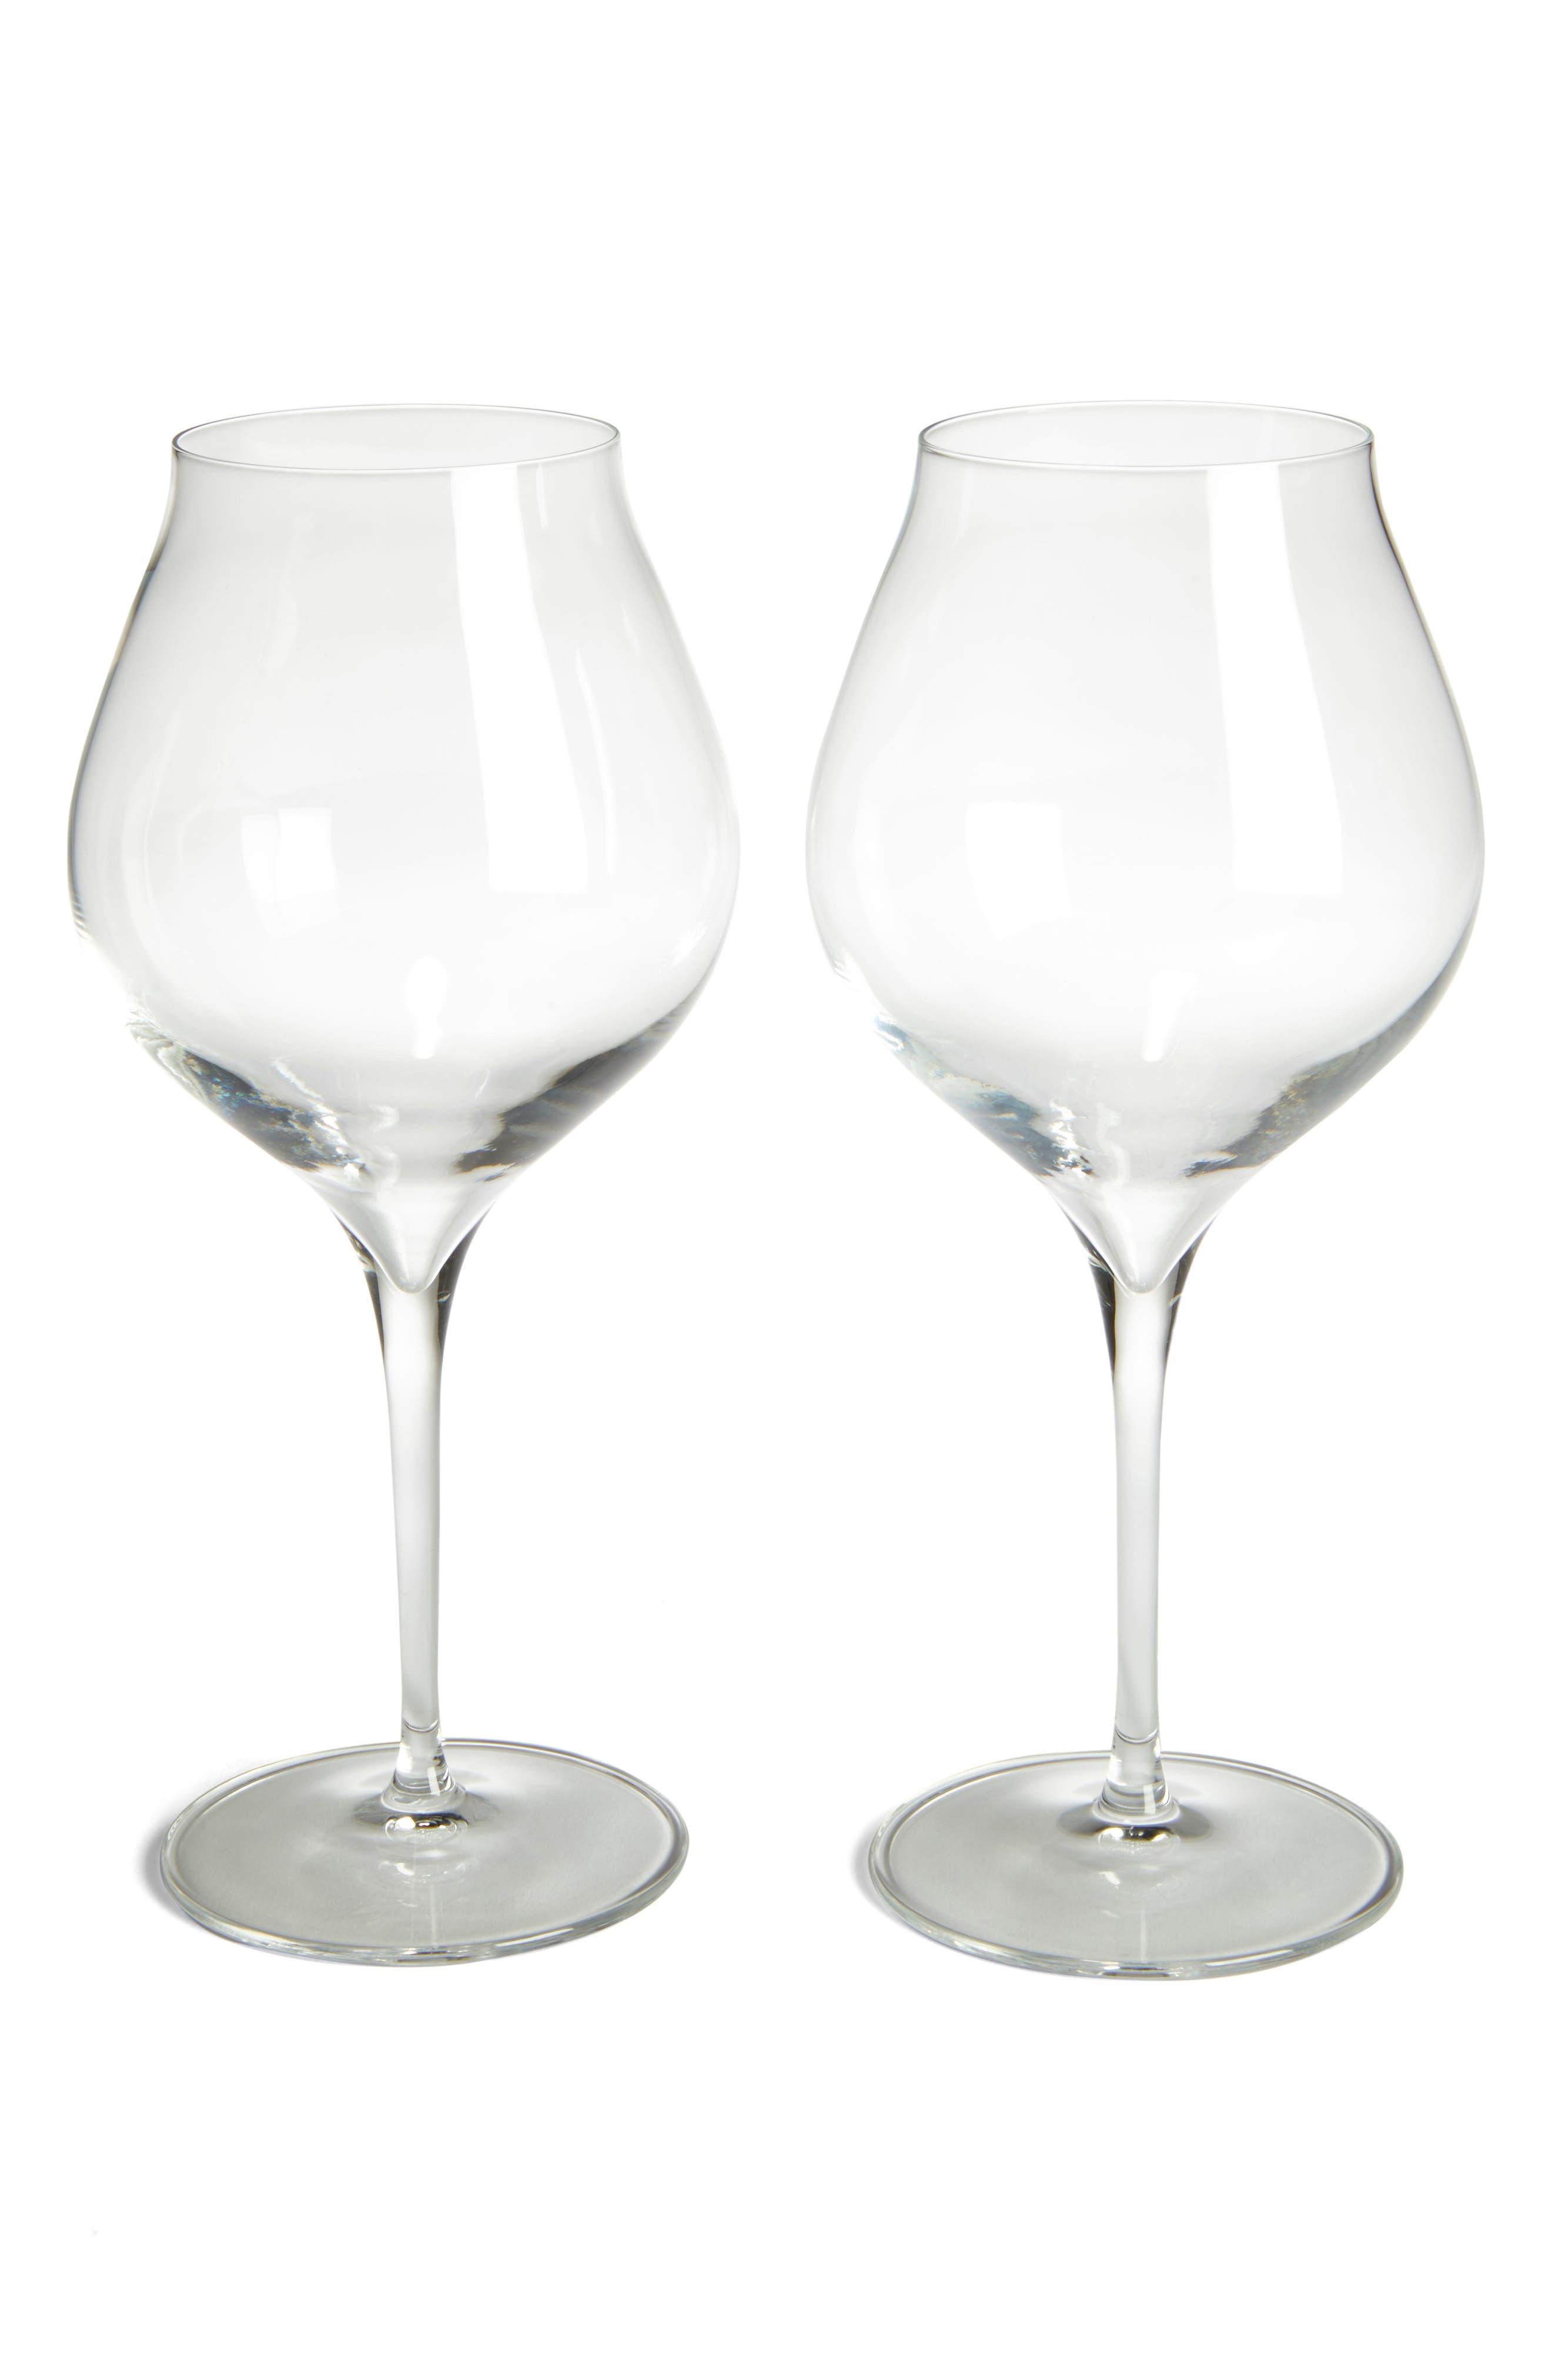 Alternate Image 1 Selected - Luigi Bormiolo Vinea Corvina/Amarone Set of 2 Red Wine Glasses